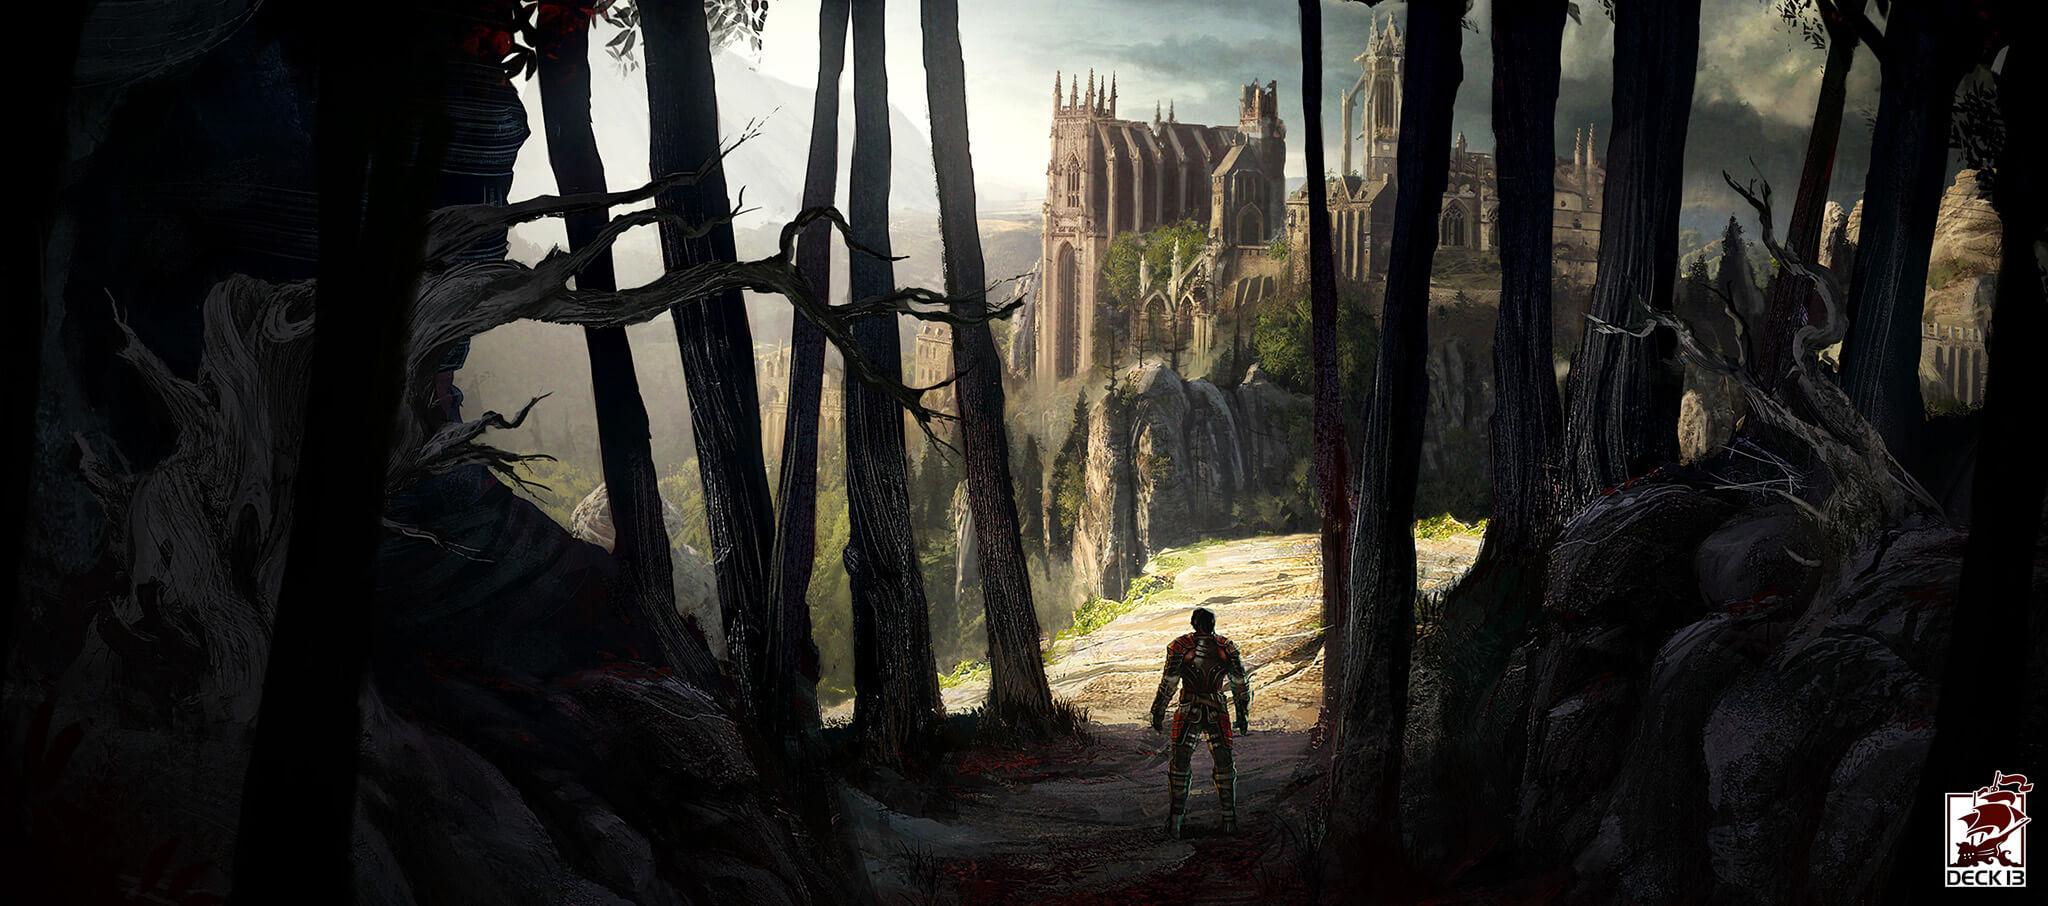 blood-knights-concept-art-felix-haas-carpathian-mood-001